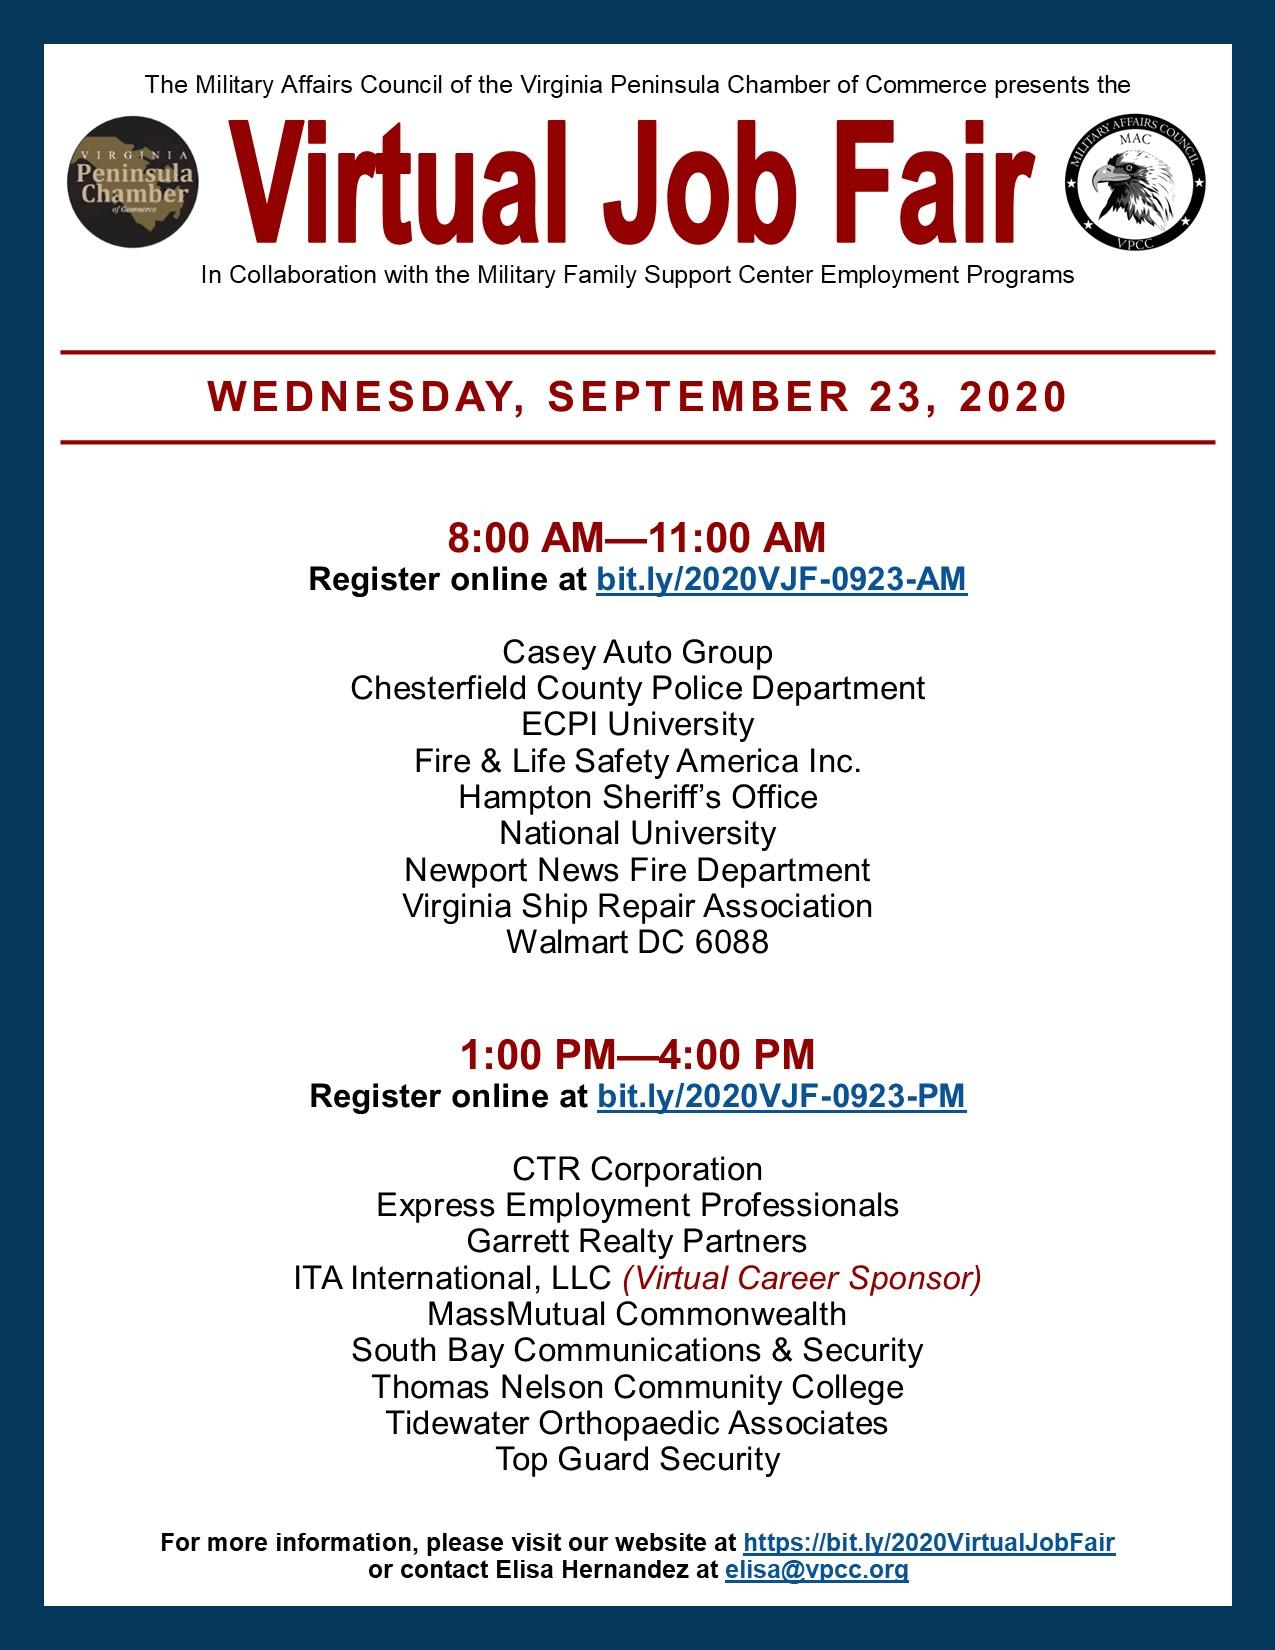 2020-Virtual-Job-Fair-(JOB-SEEKER-FLYER---EDITED-0716).jpg